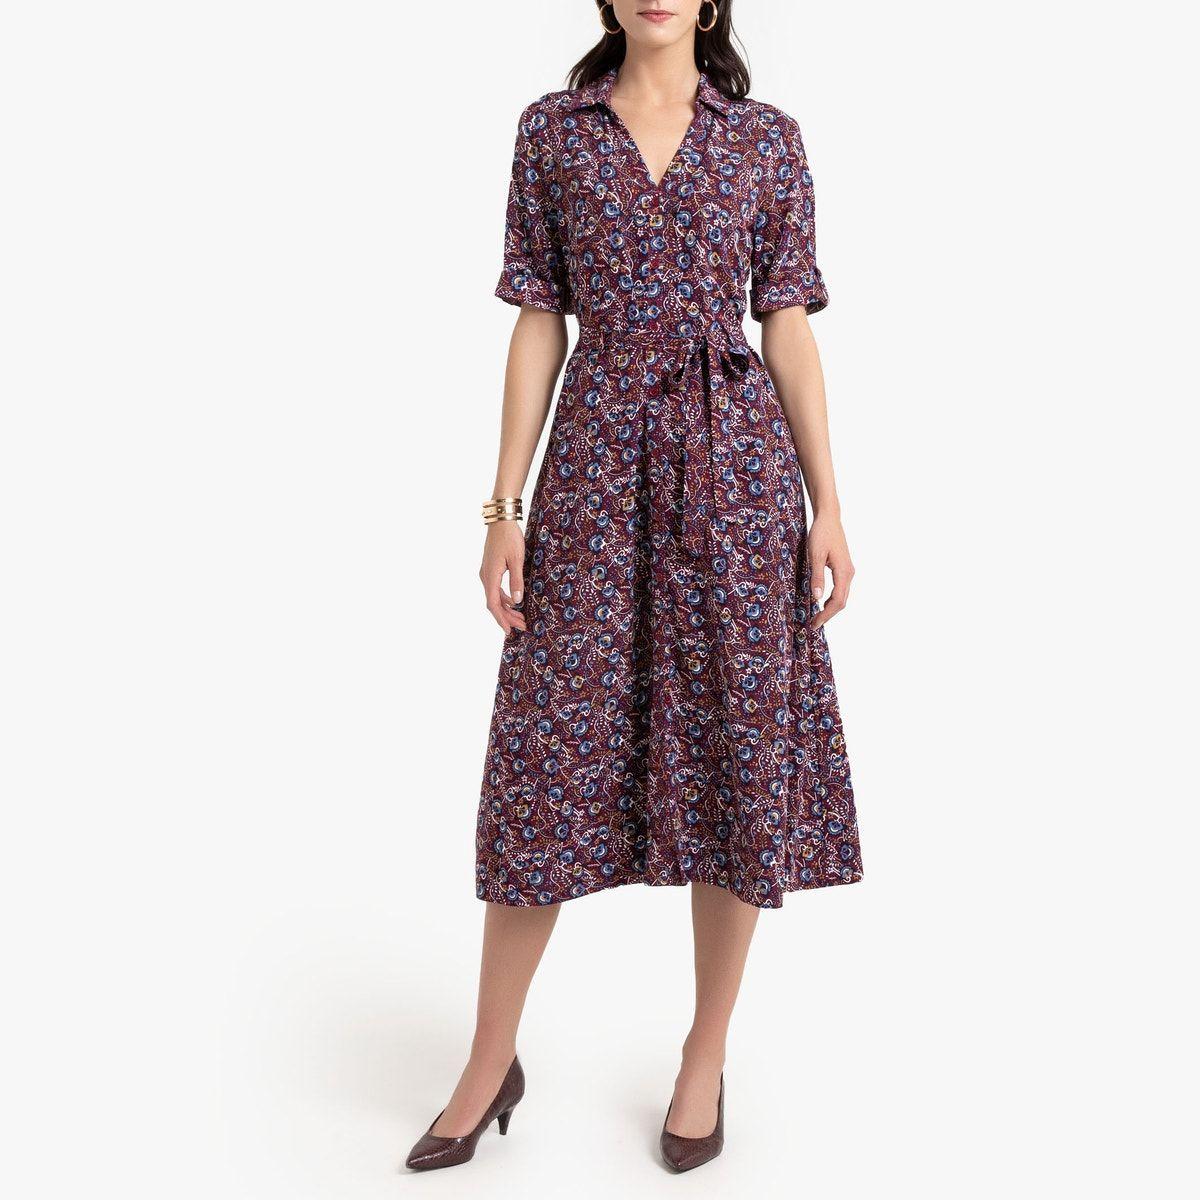 robe longue Évasée, anne weyburn - violet - - 46 (fr) - 44